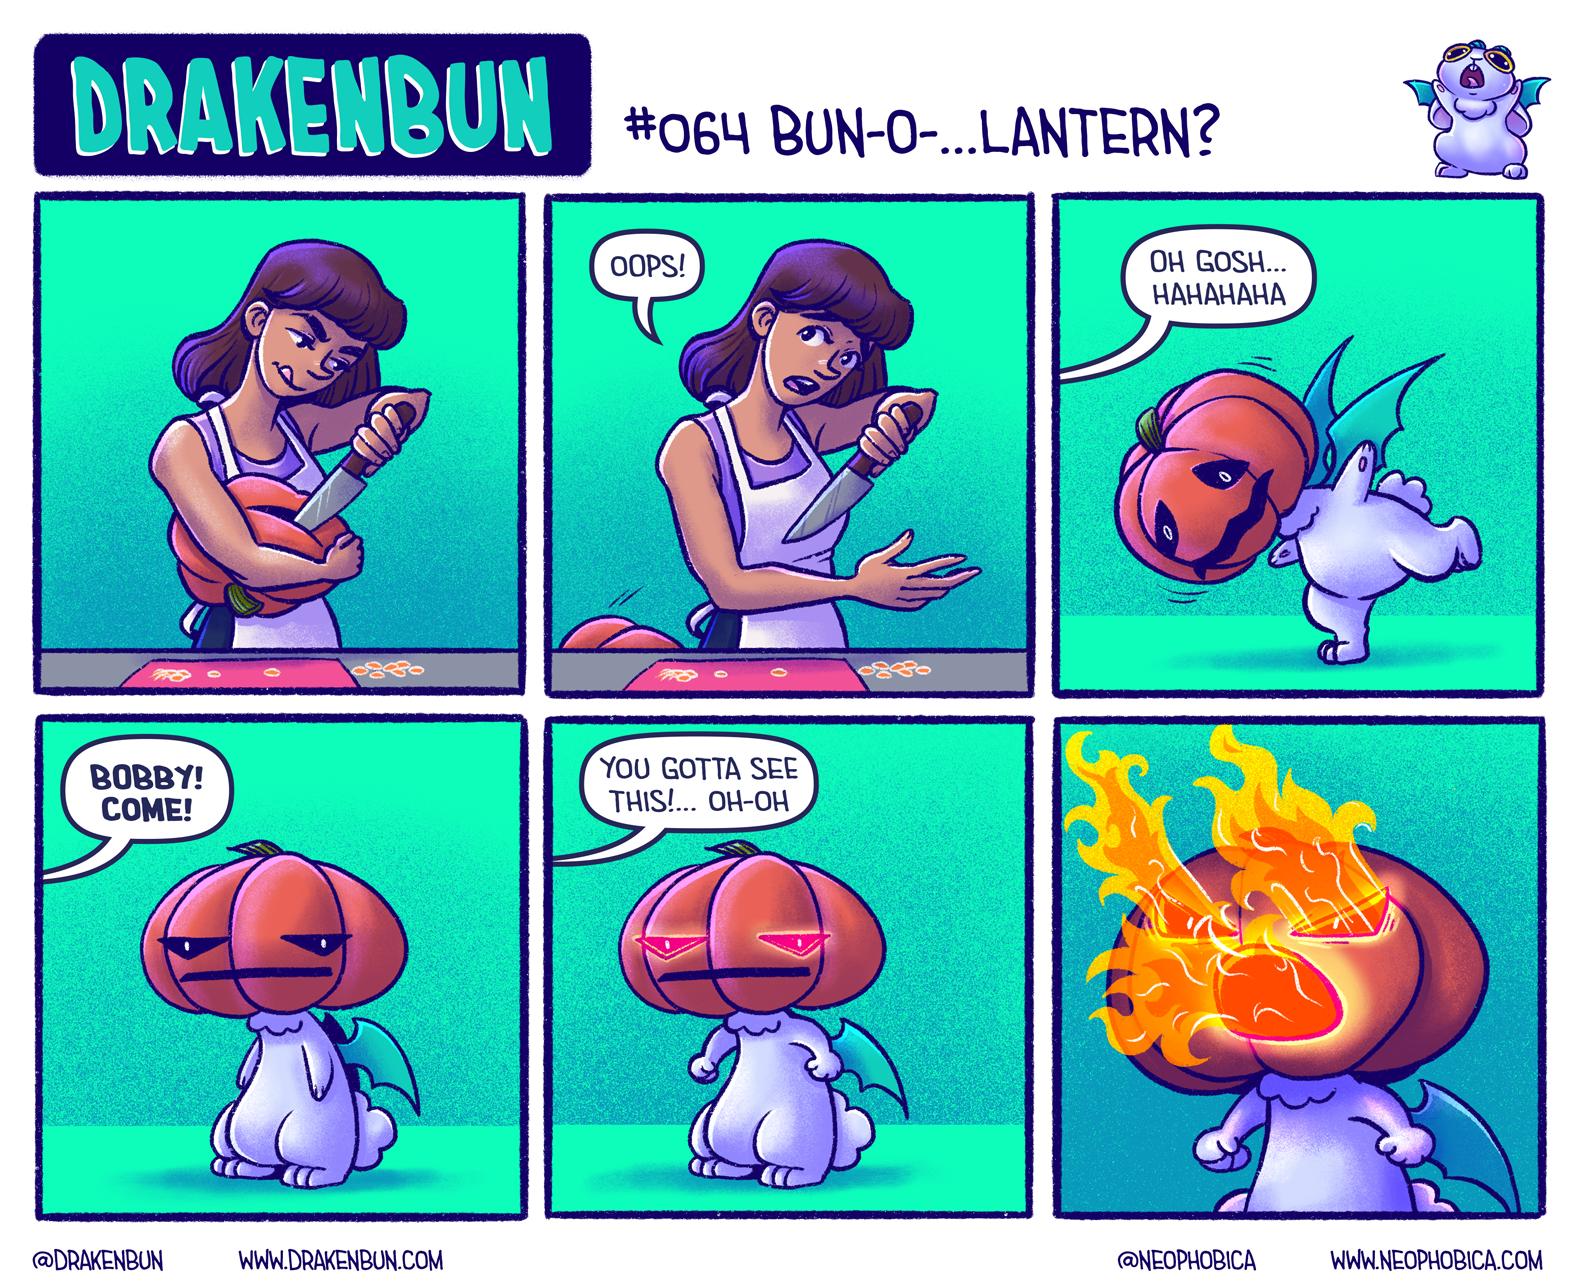 #064 Bun-O-…Lantern?